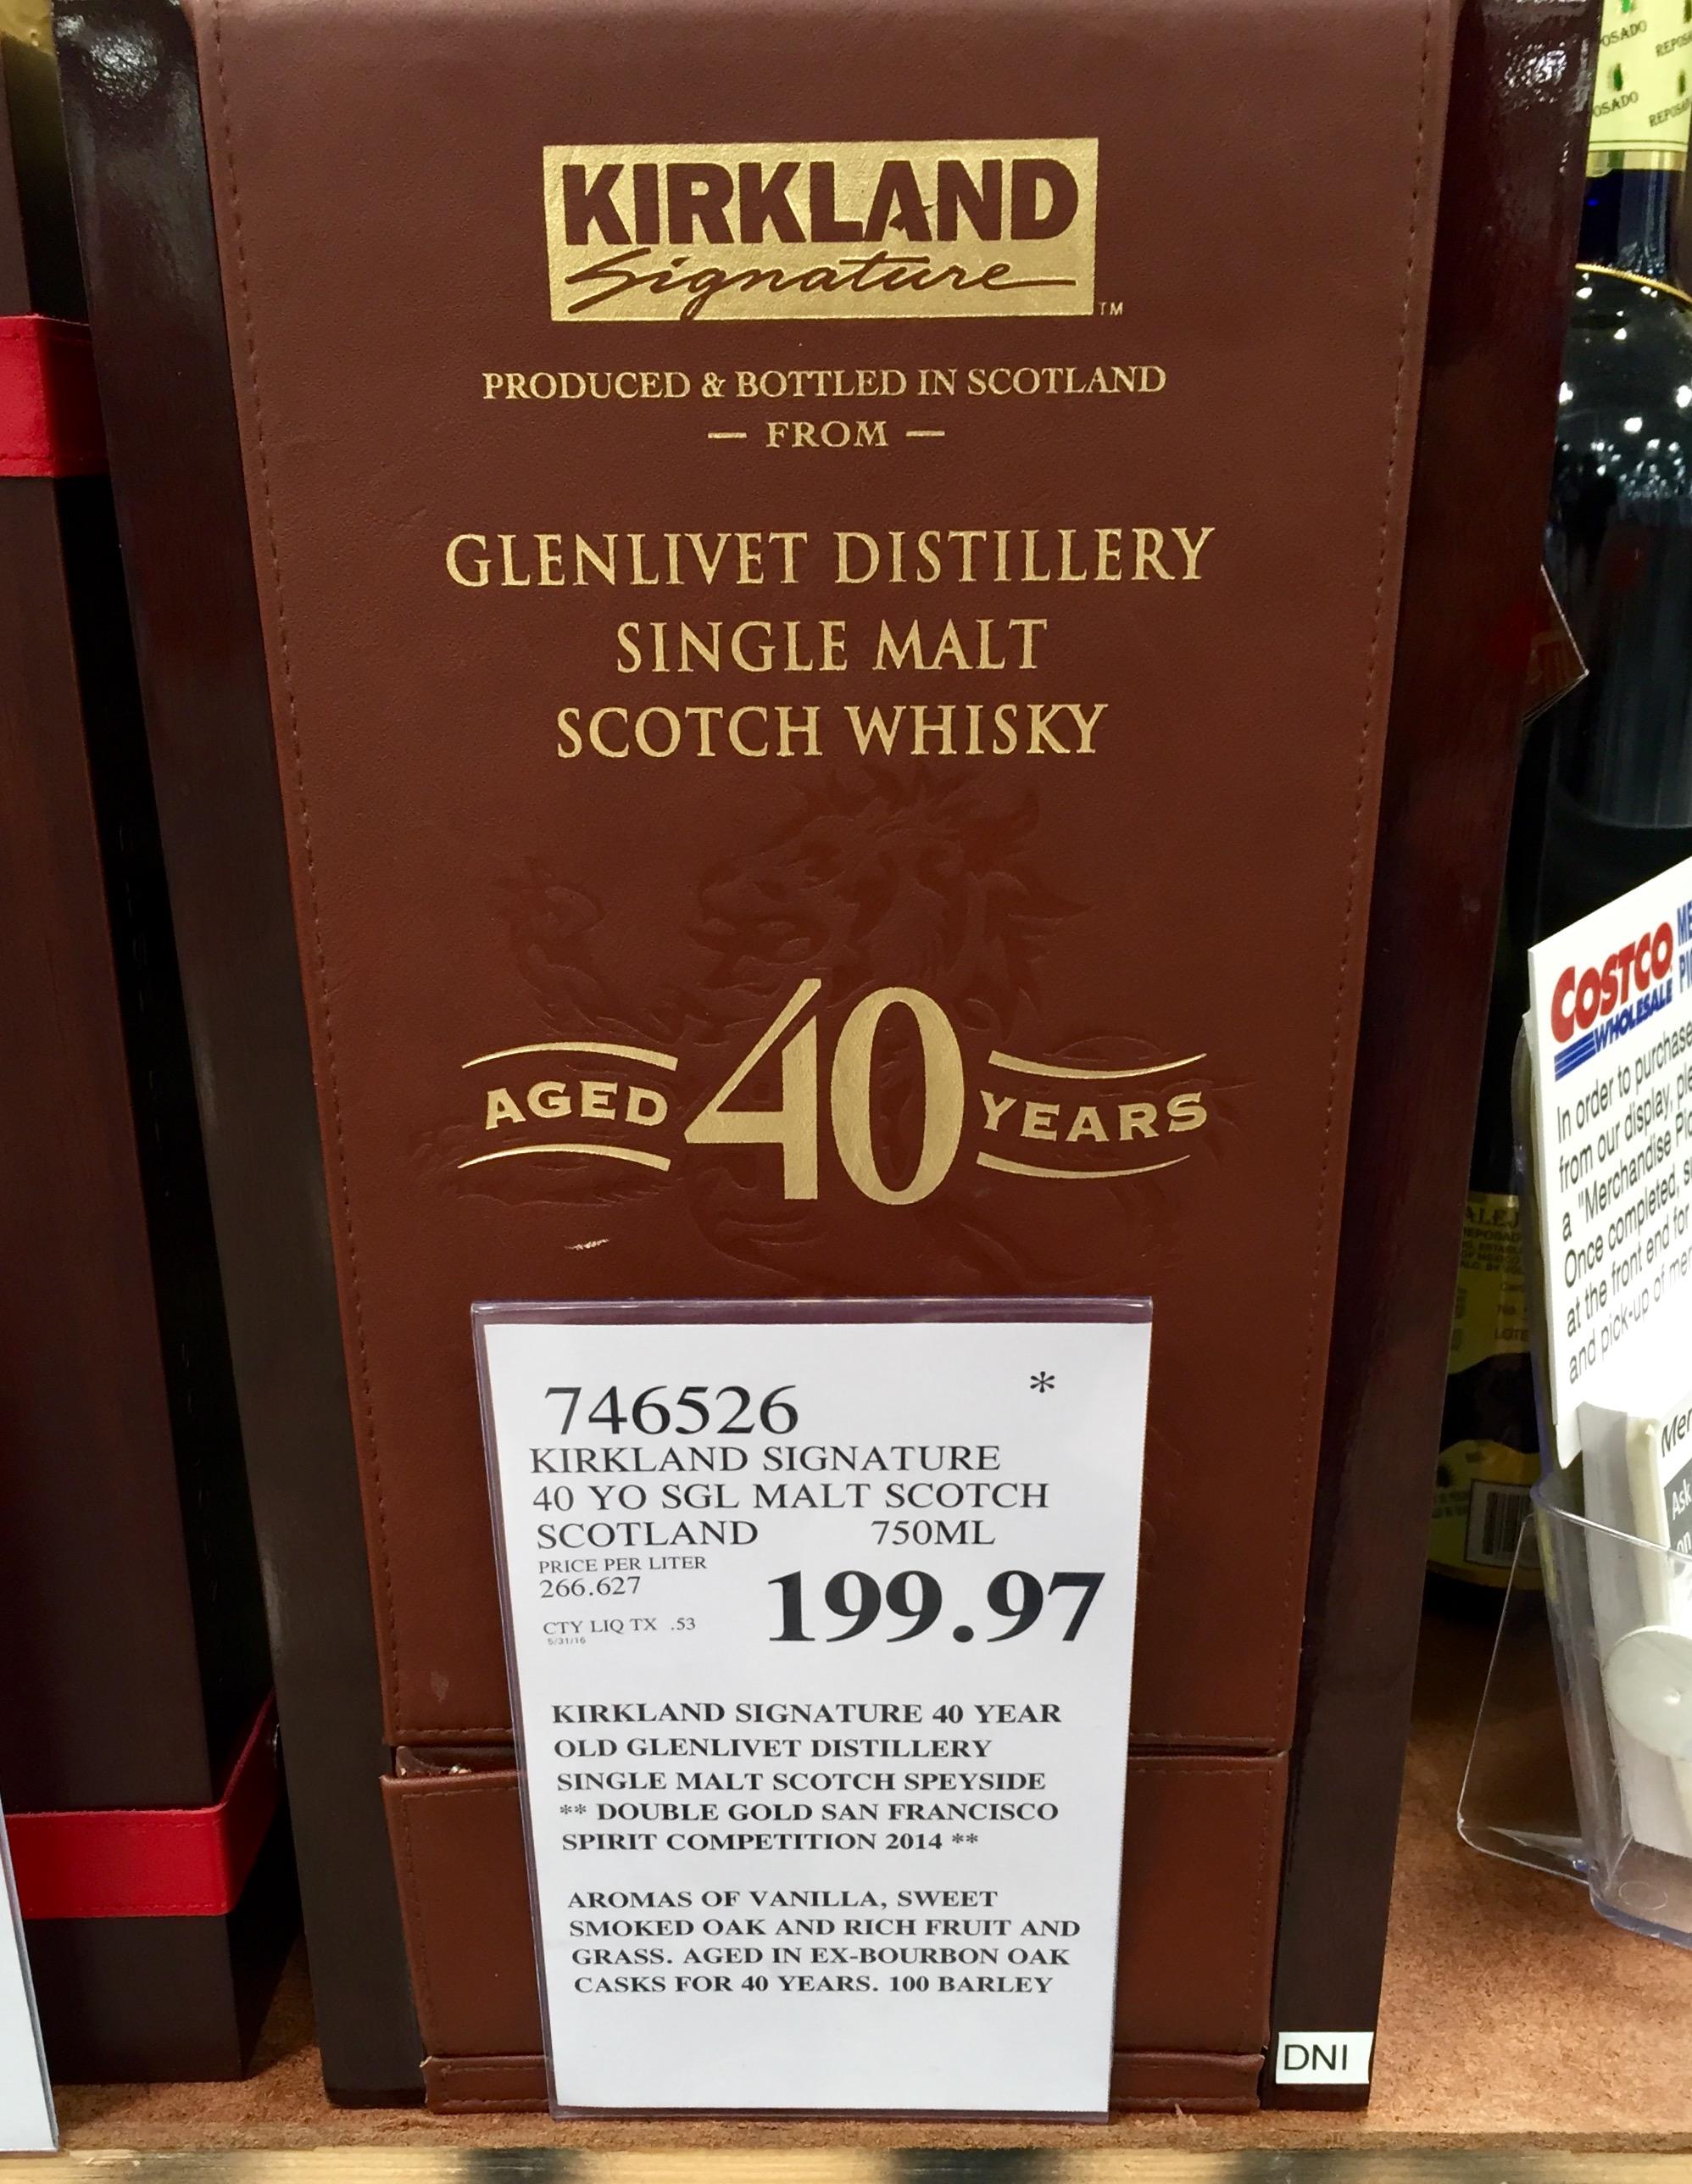 kirkland signature glenlivet 40 year old single malt scotch